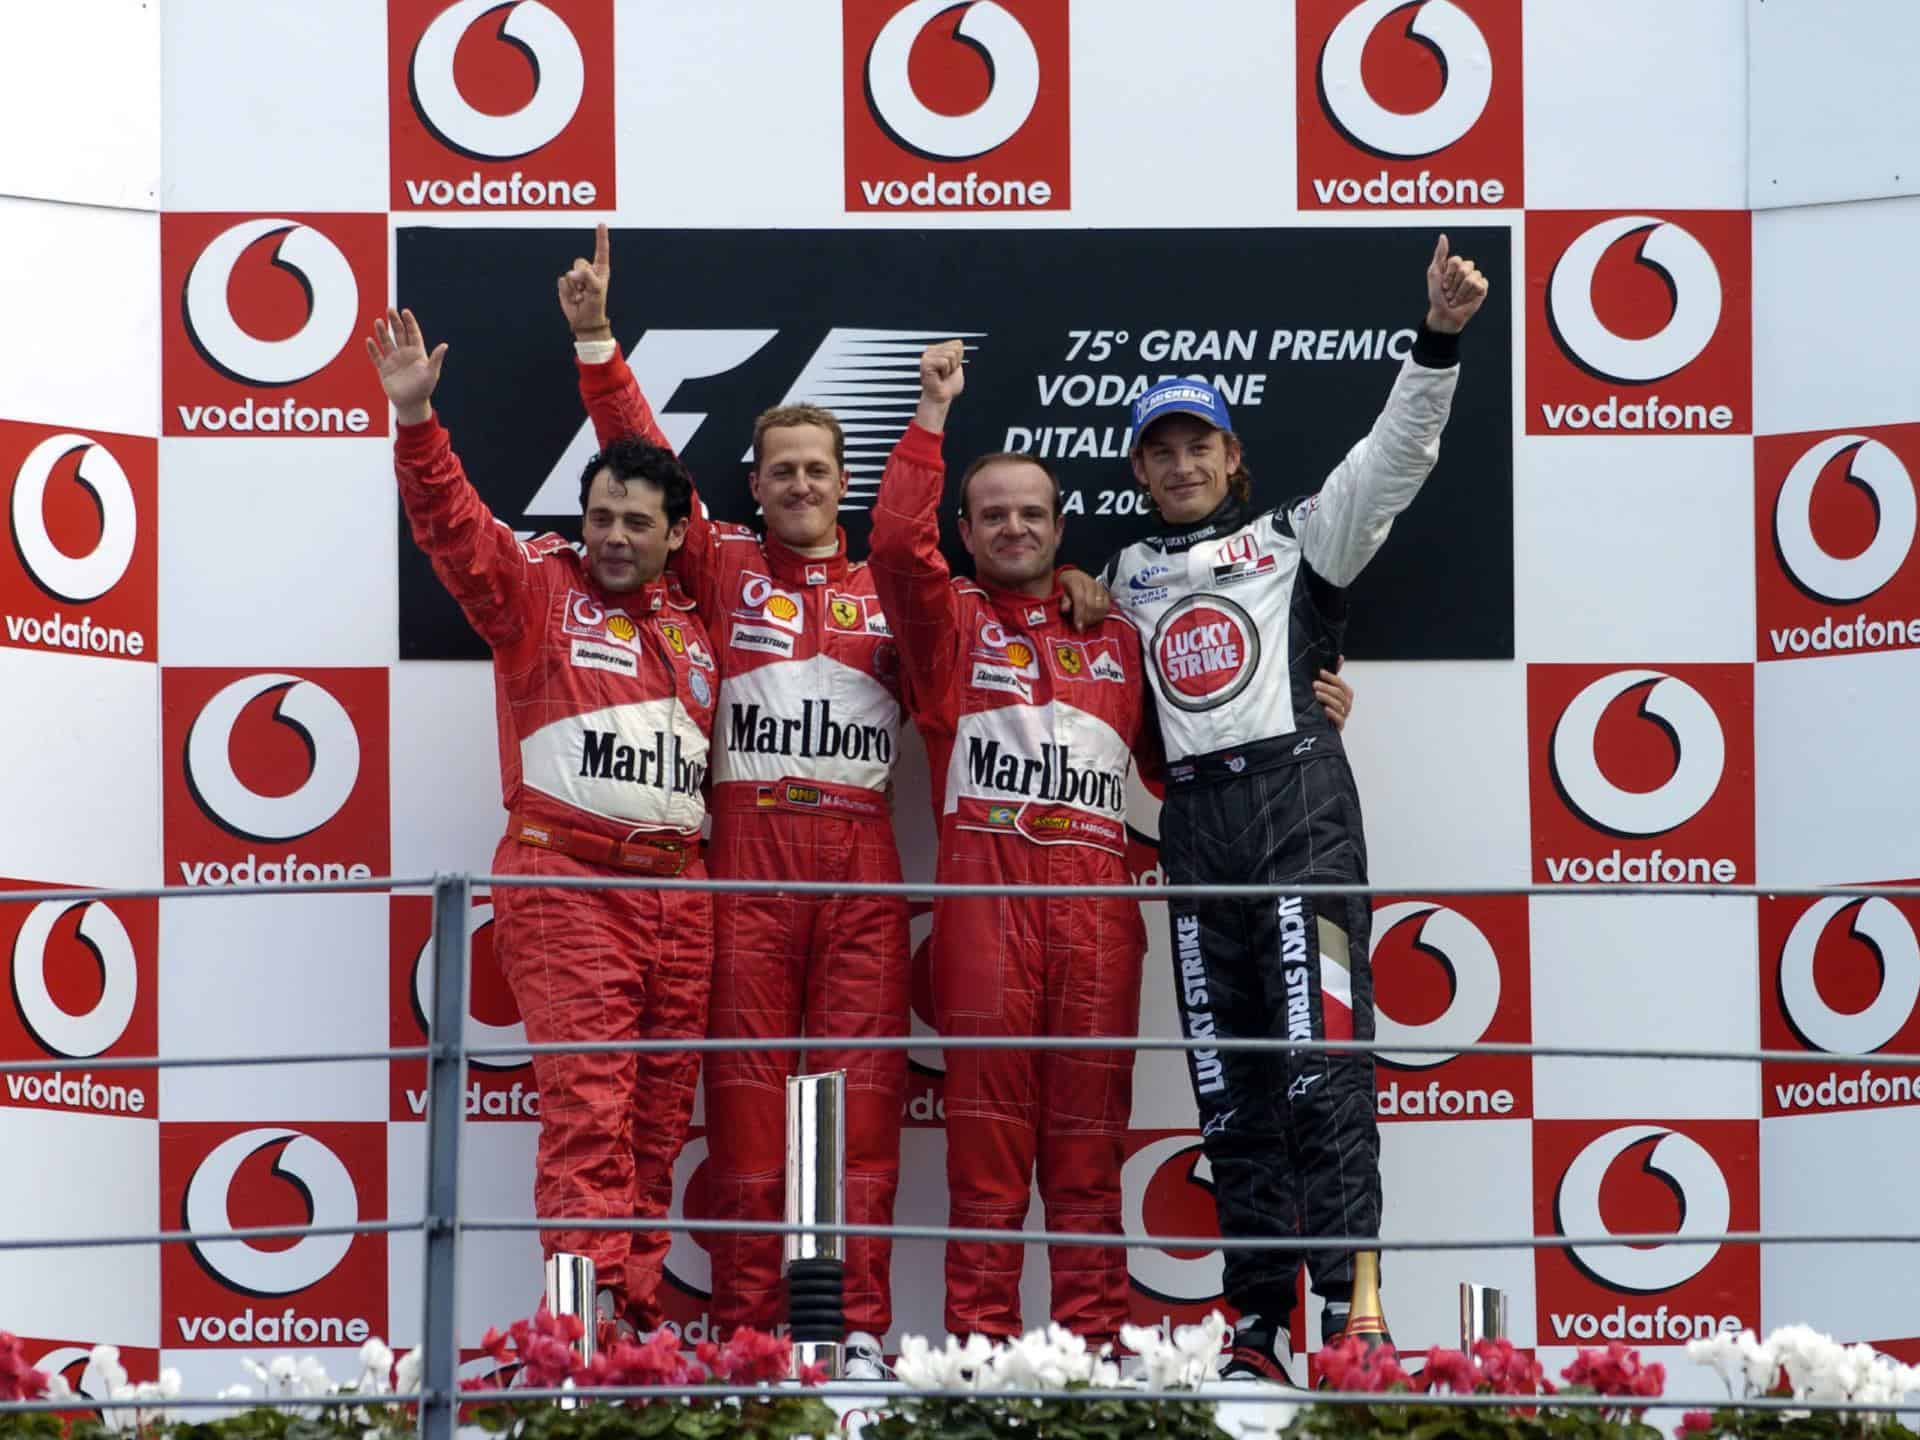 Italian GP F1 2004 Monza podium Photo Ferrari